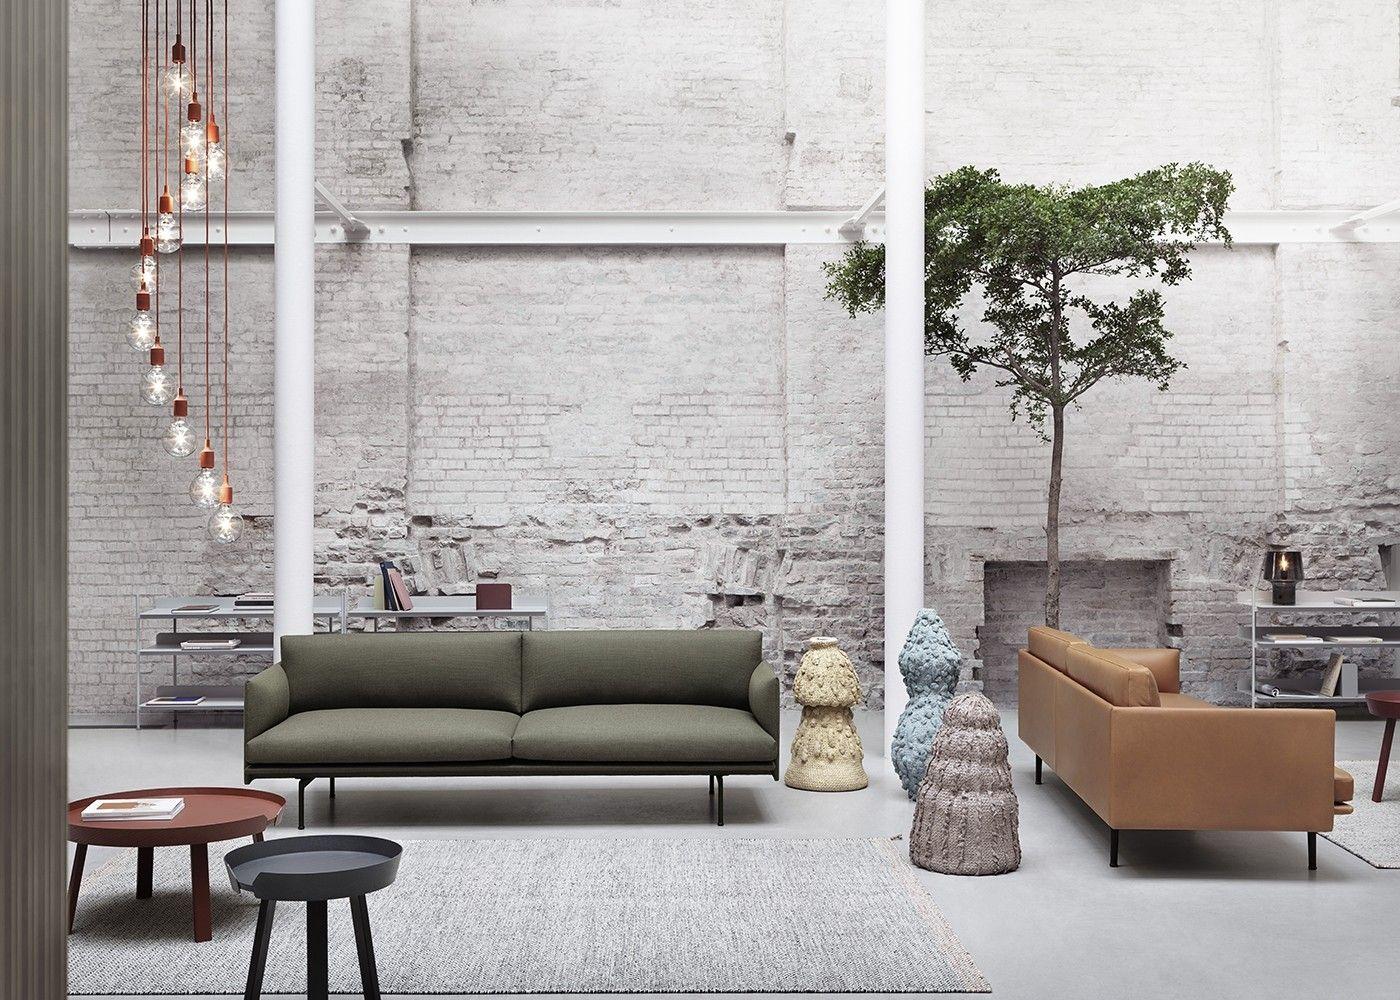 Outline 3 Seater Sofa Muuto Furniture Elegant Sofa Best Leather Sofa